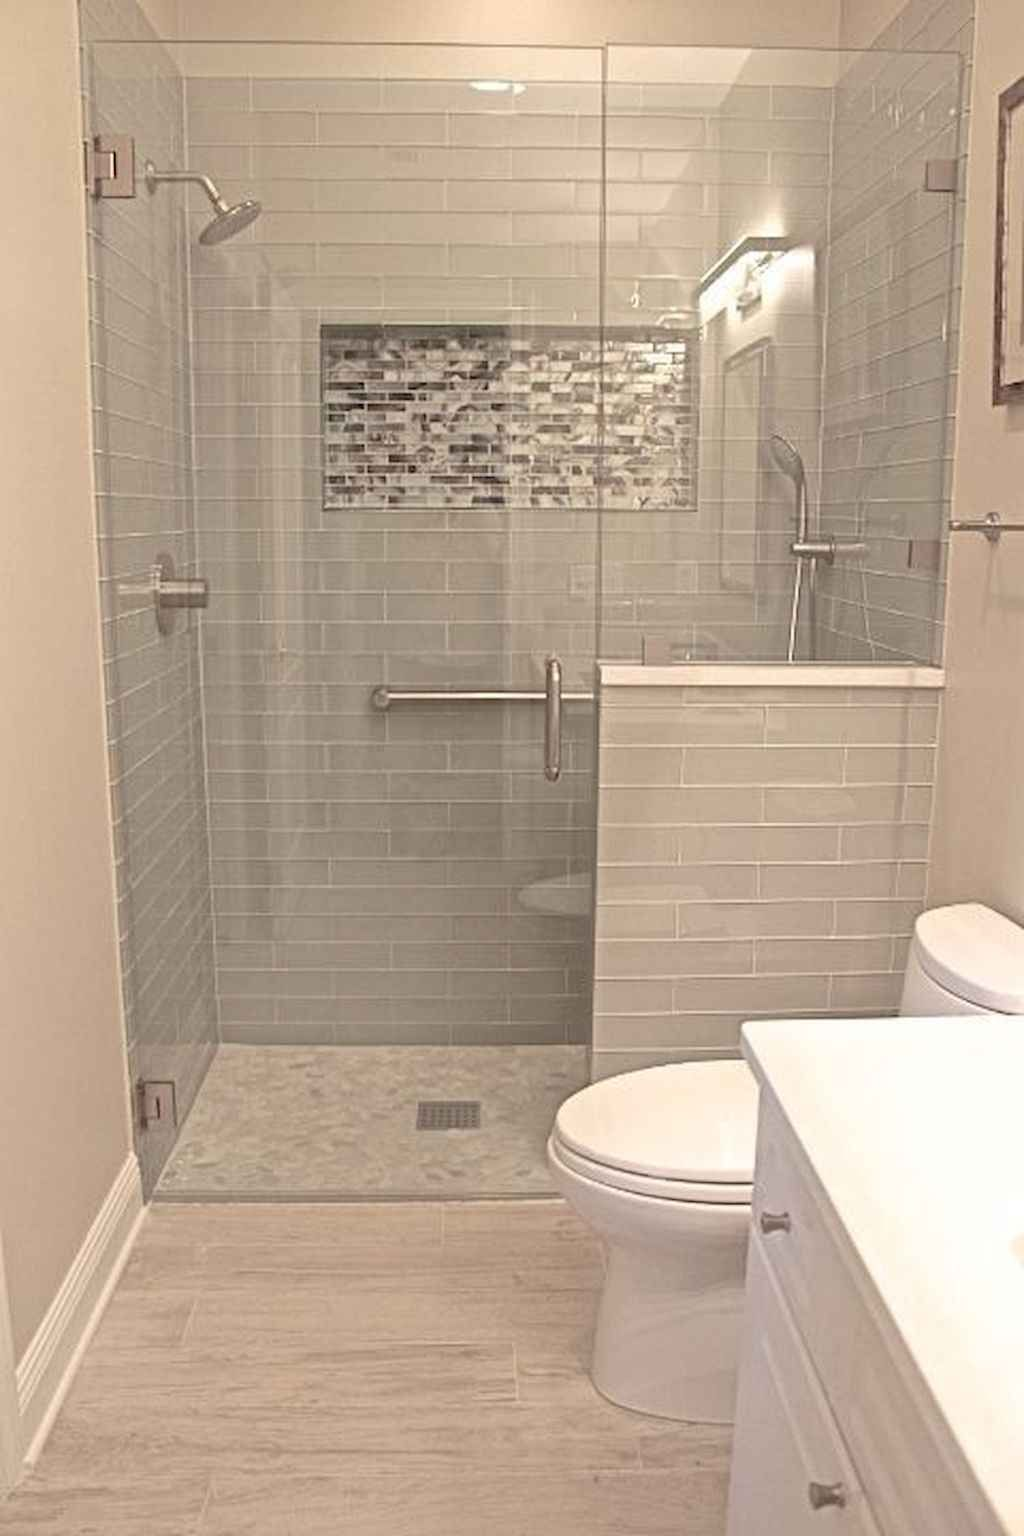 70 Small Master Bathroom Makeover Ideas On A Budget Setyouroom Com Bathroom Remodel Shower Cheap Bathroom Remodel Bathroom Design Small